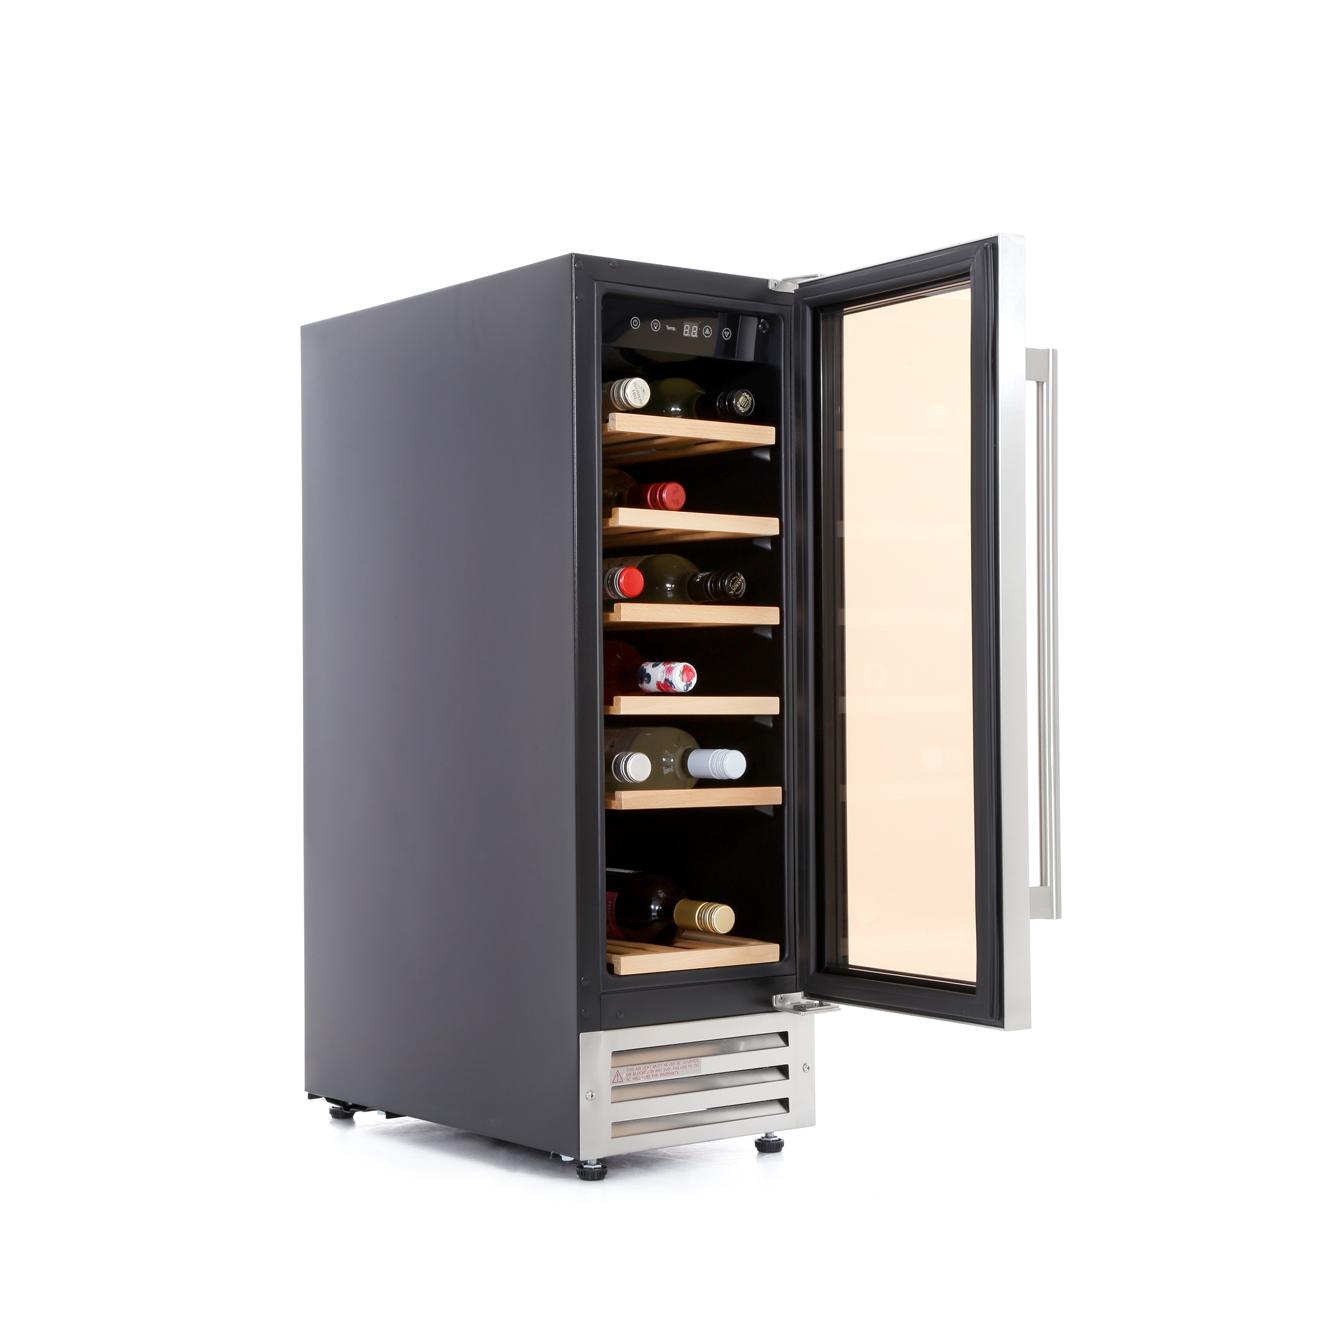 lec wc mk stainless steel wine cooler ()  buy online  - lec wc mk stainless steel wine cooler